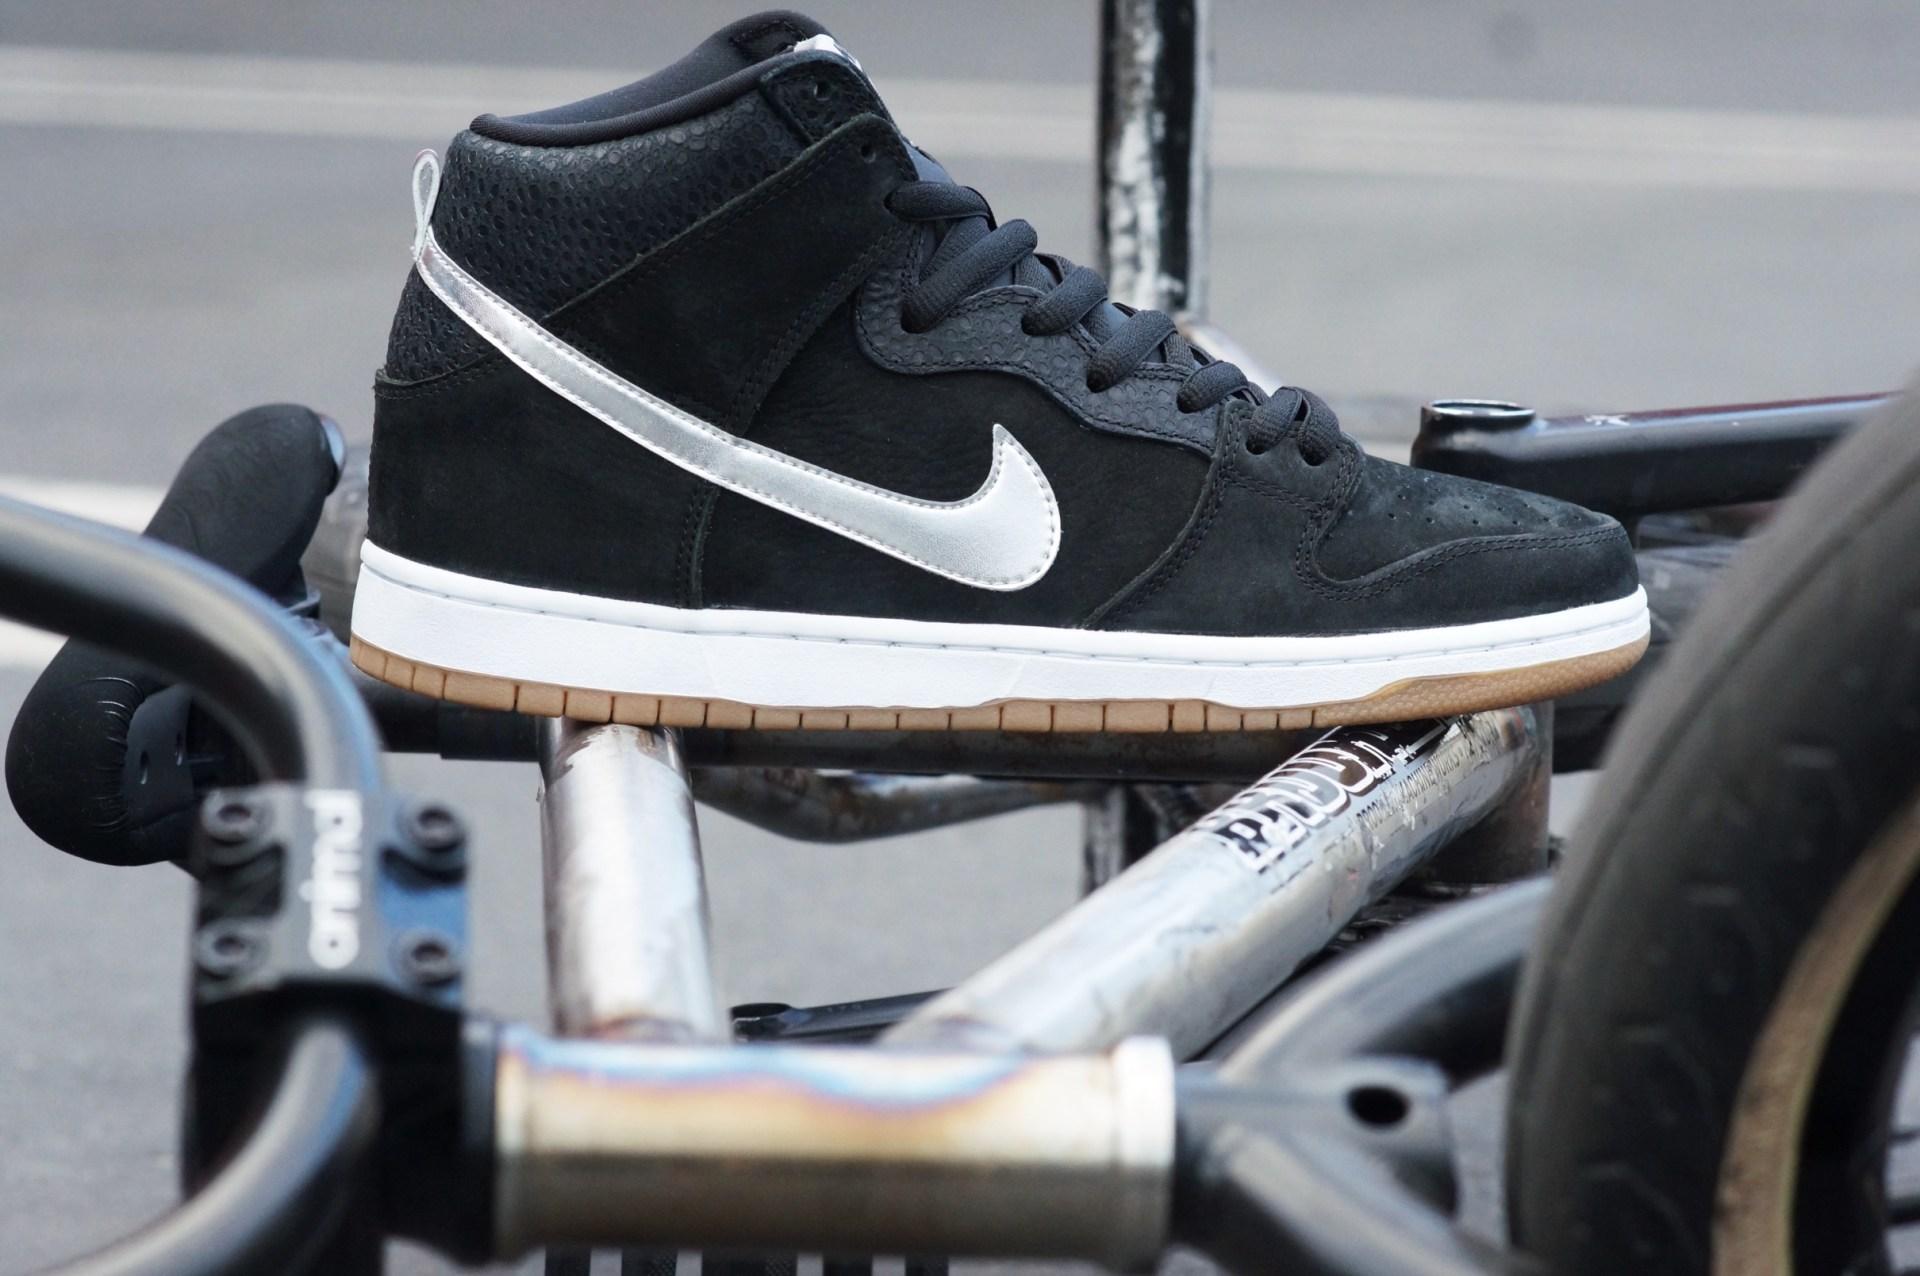 sale retailer 87b95 d888c Nigel Sylvester x Nike SB Dunk High